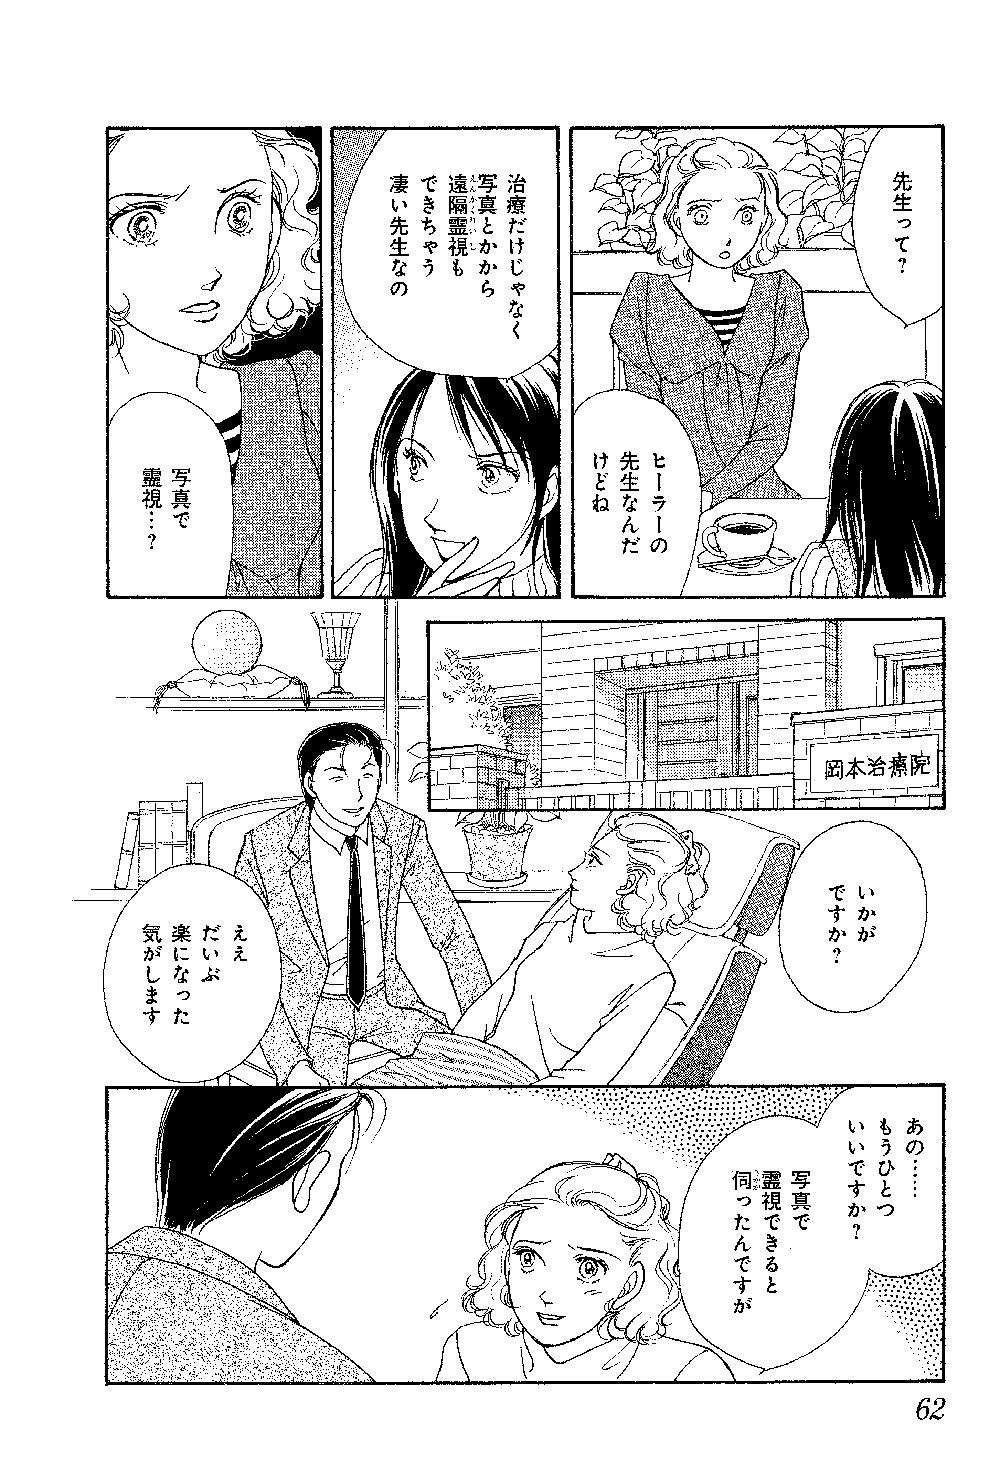 mayuri_0001_0062.jpg